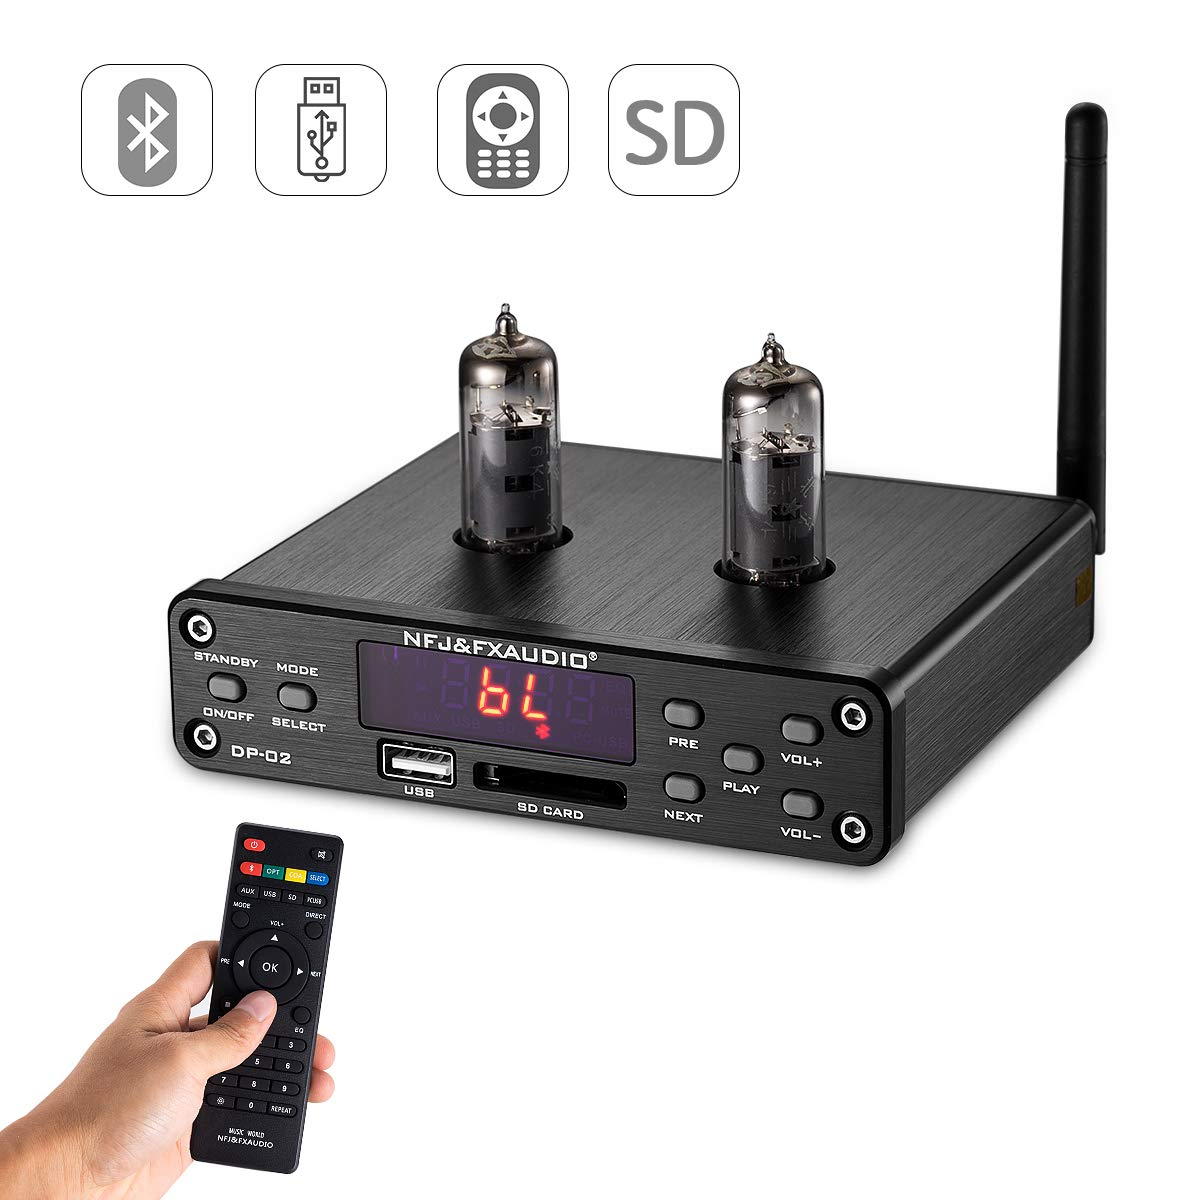 Nobsound HiFi 6K4 Vacuum Tube Preamplifier, Wireless Audio Hi-Fi Stereo Preamp, Remote Control, Bluetooth, U-Disk, SD Card, 3.5mm AUX, RCA Inputs (Black) by Douk Audio